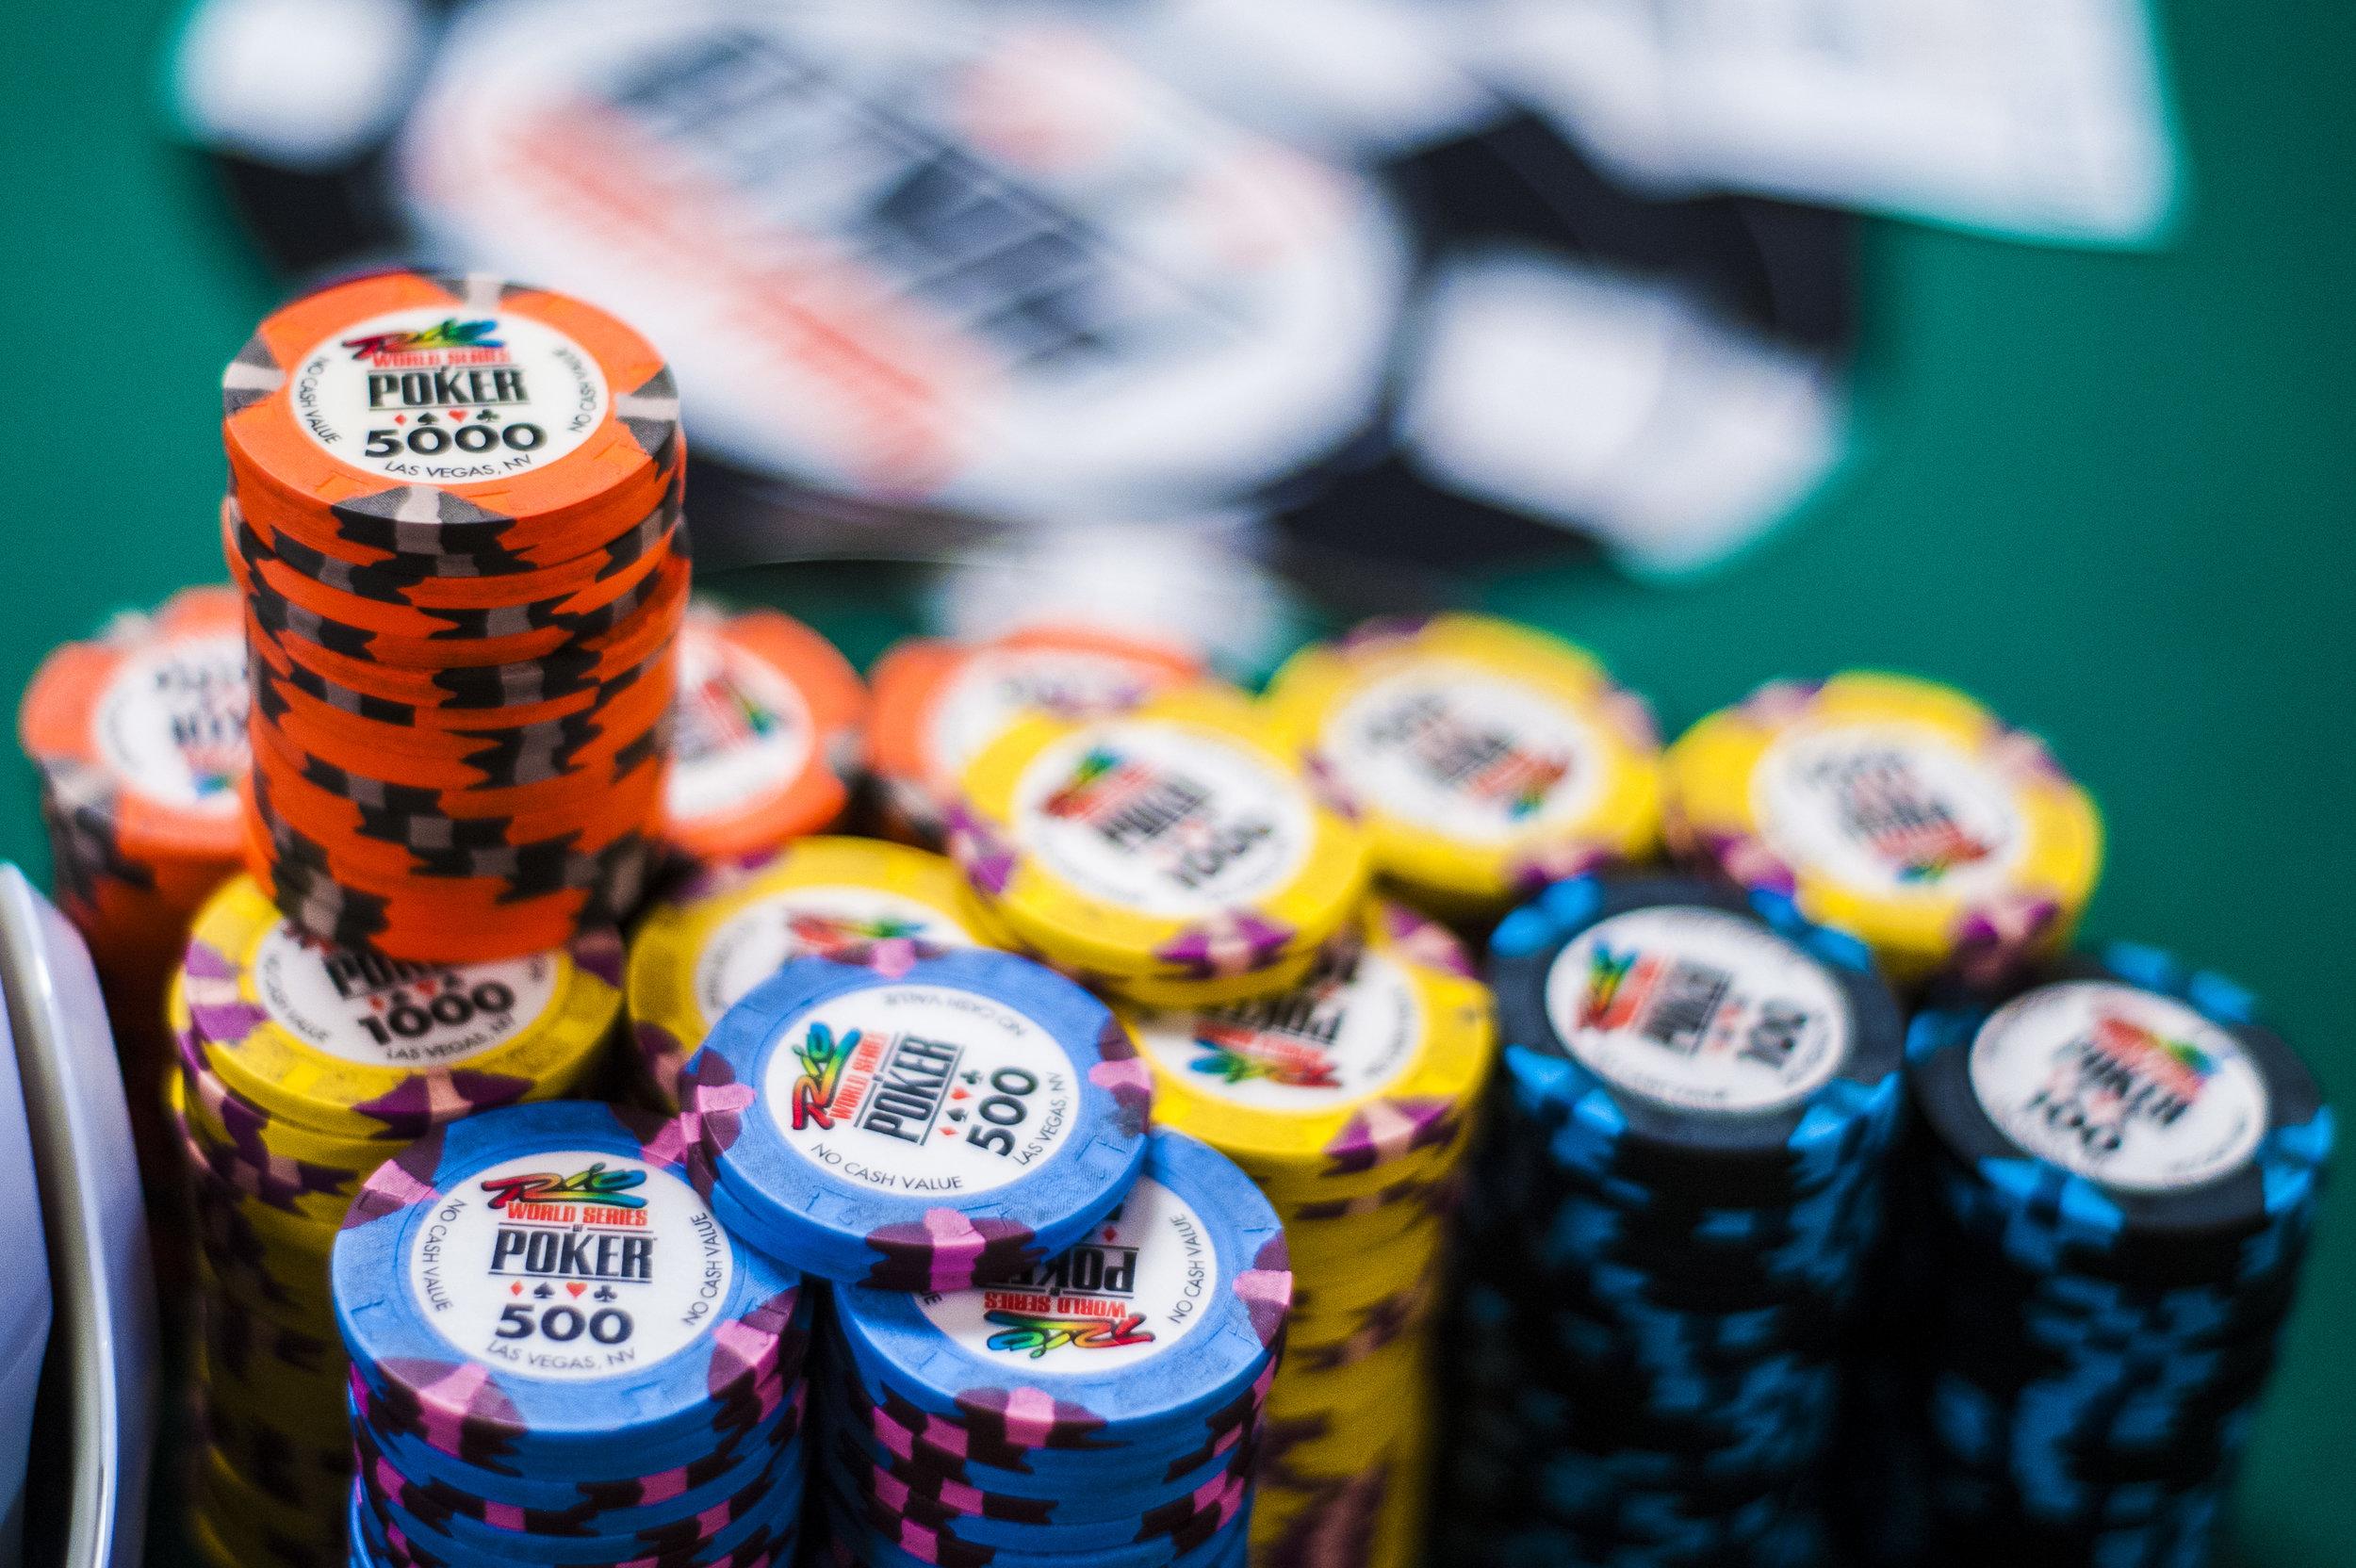 WSOP Main Event_2016 World Series of Poker_EV68_Day3_Amato_7DA0976.jpg